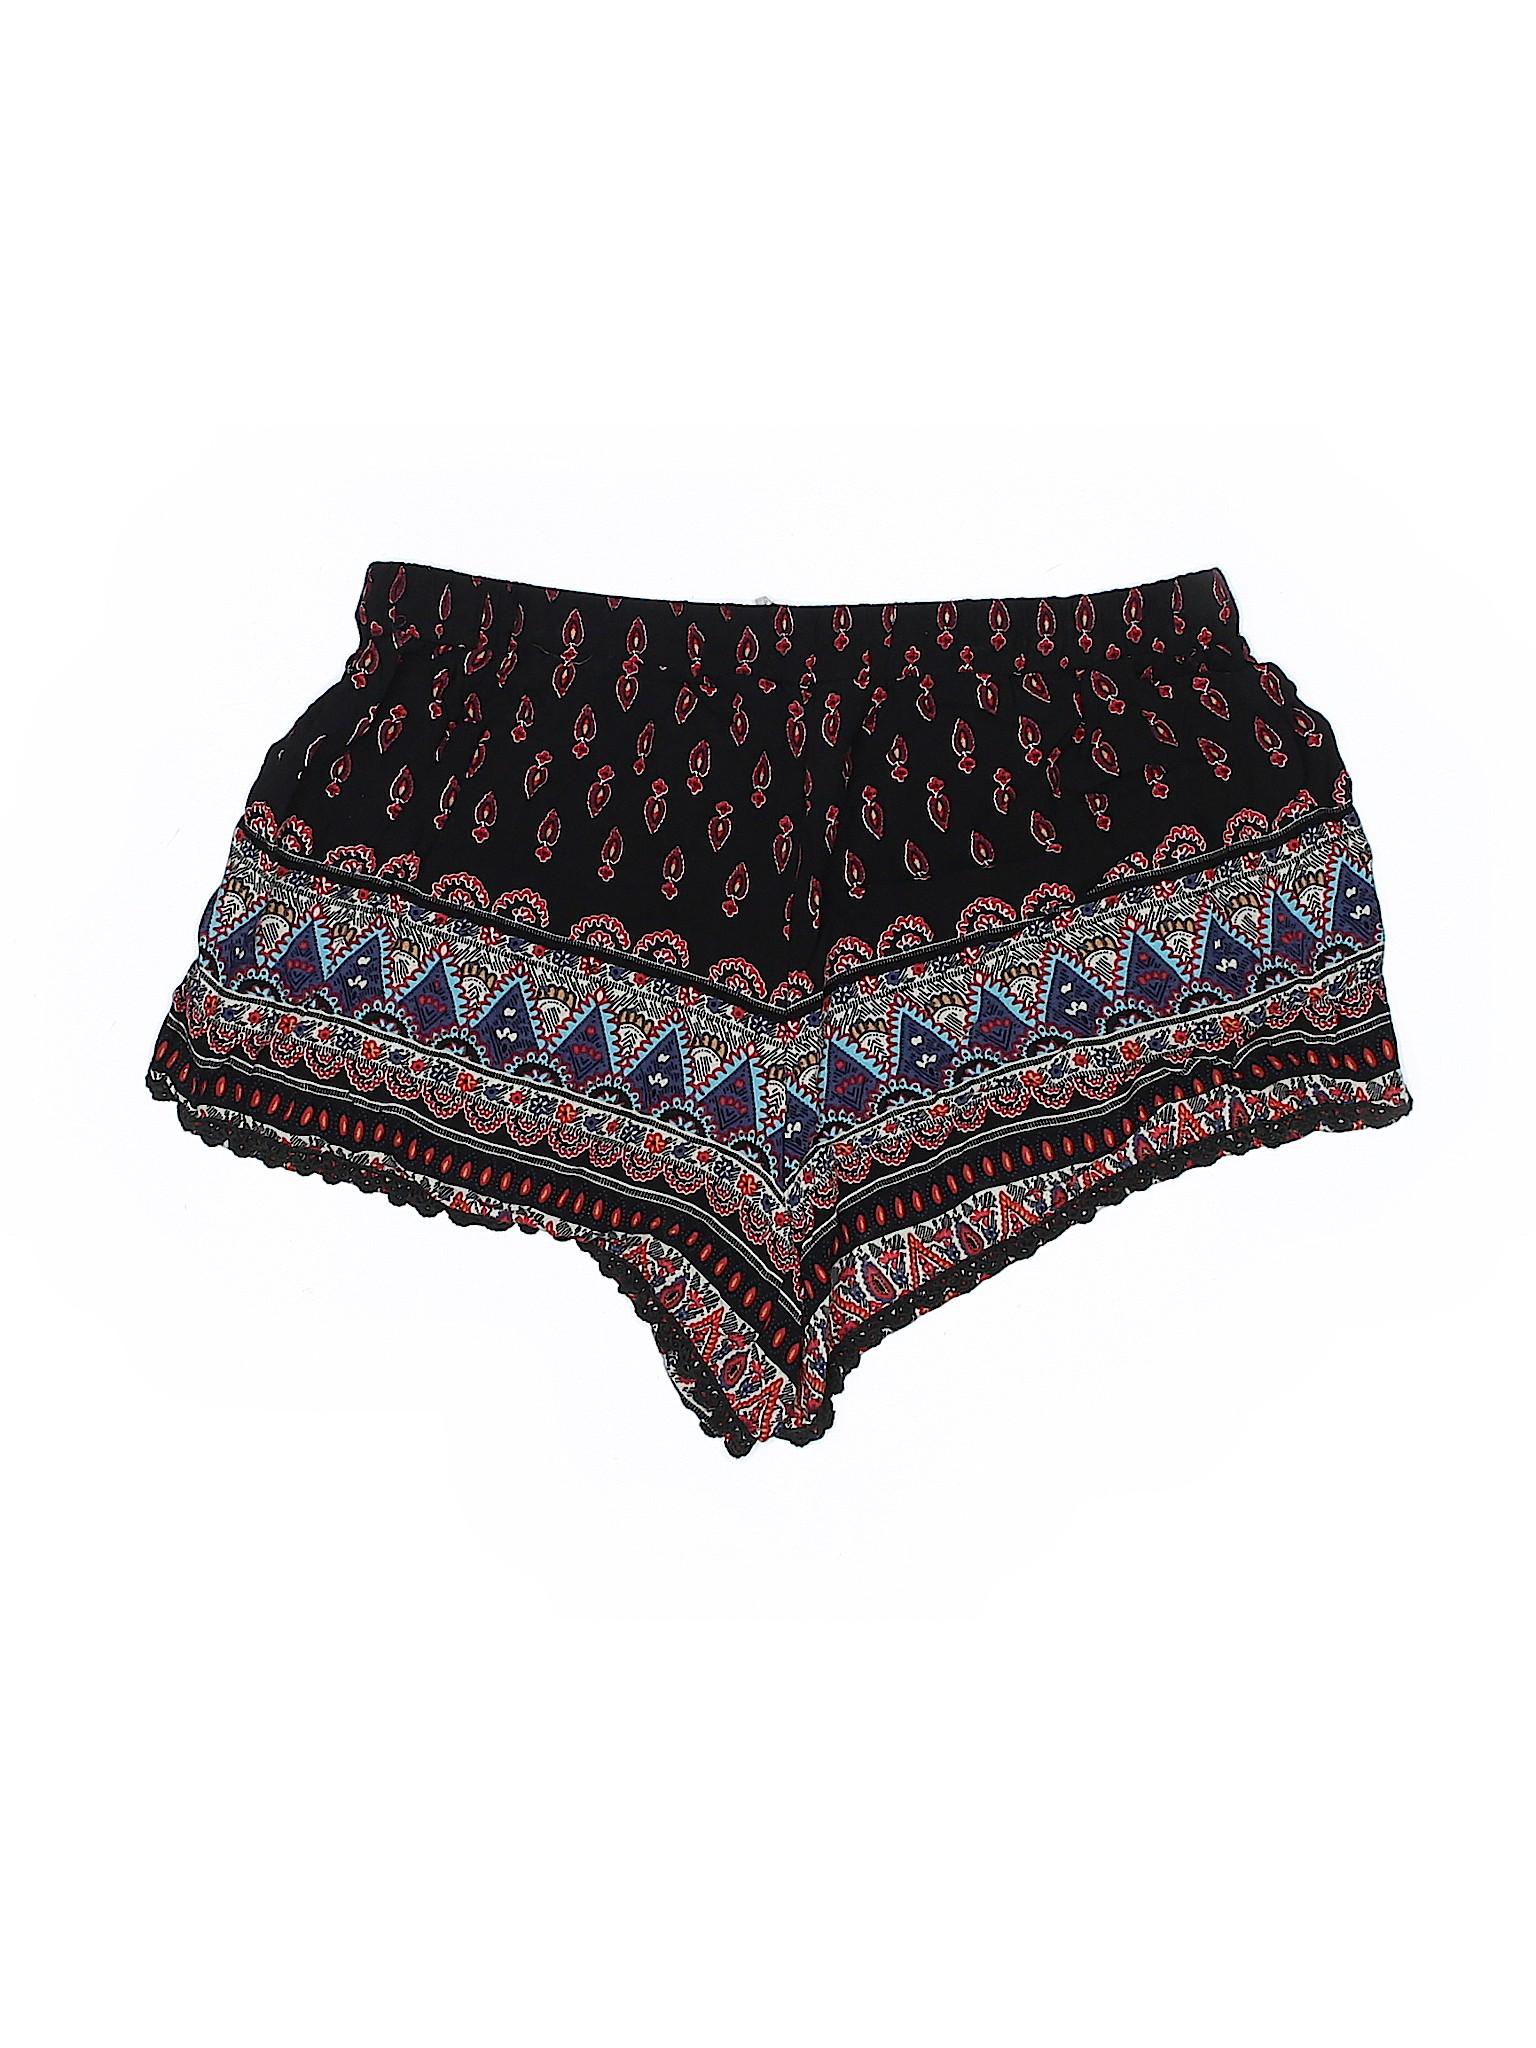 Jaase Boutique Boutique Shorts Jaase Jaase Boutique Jaase Shorts Jaase Shorts Boutique Boutique Shorts 1dHwqE1tW